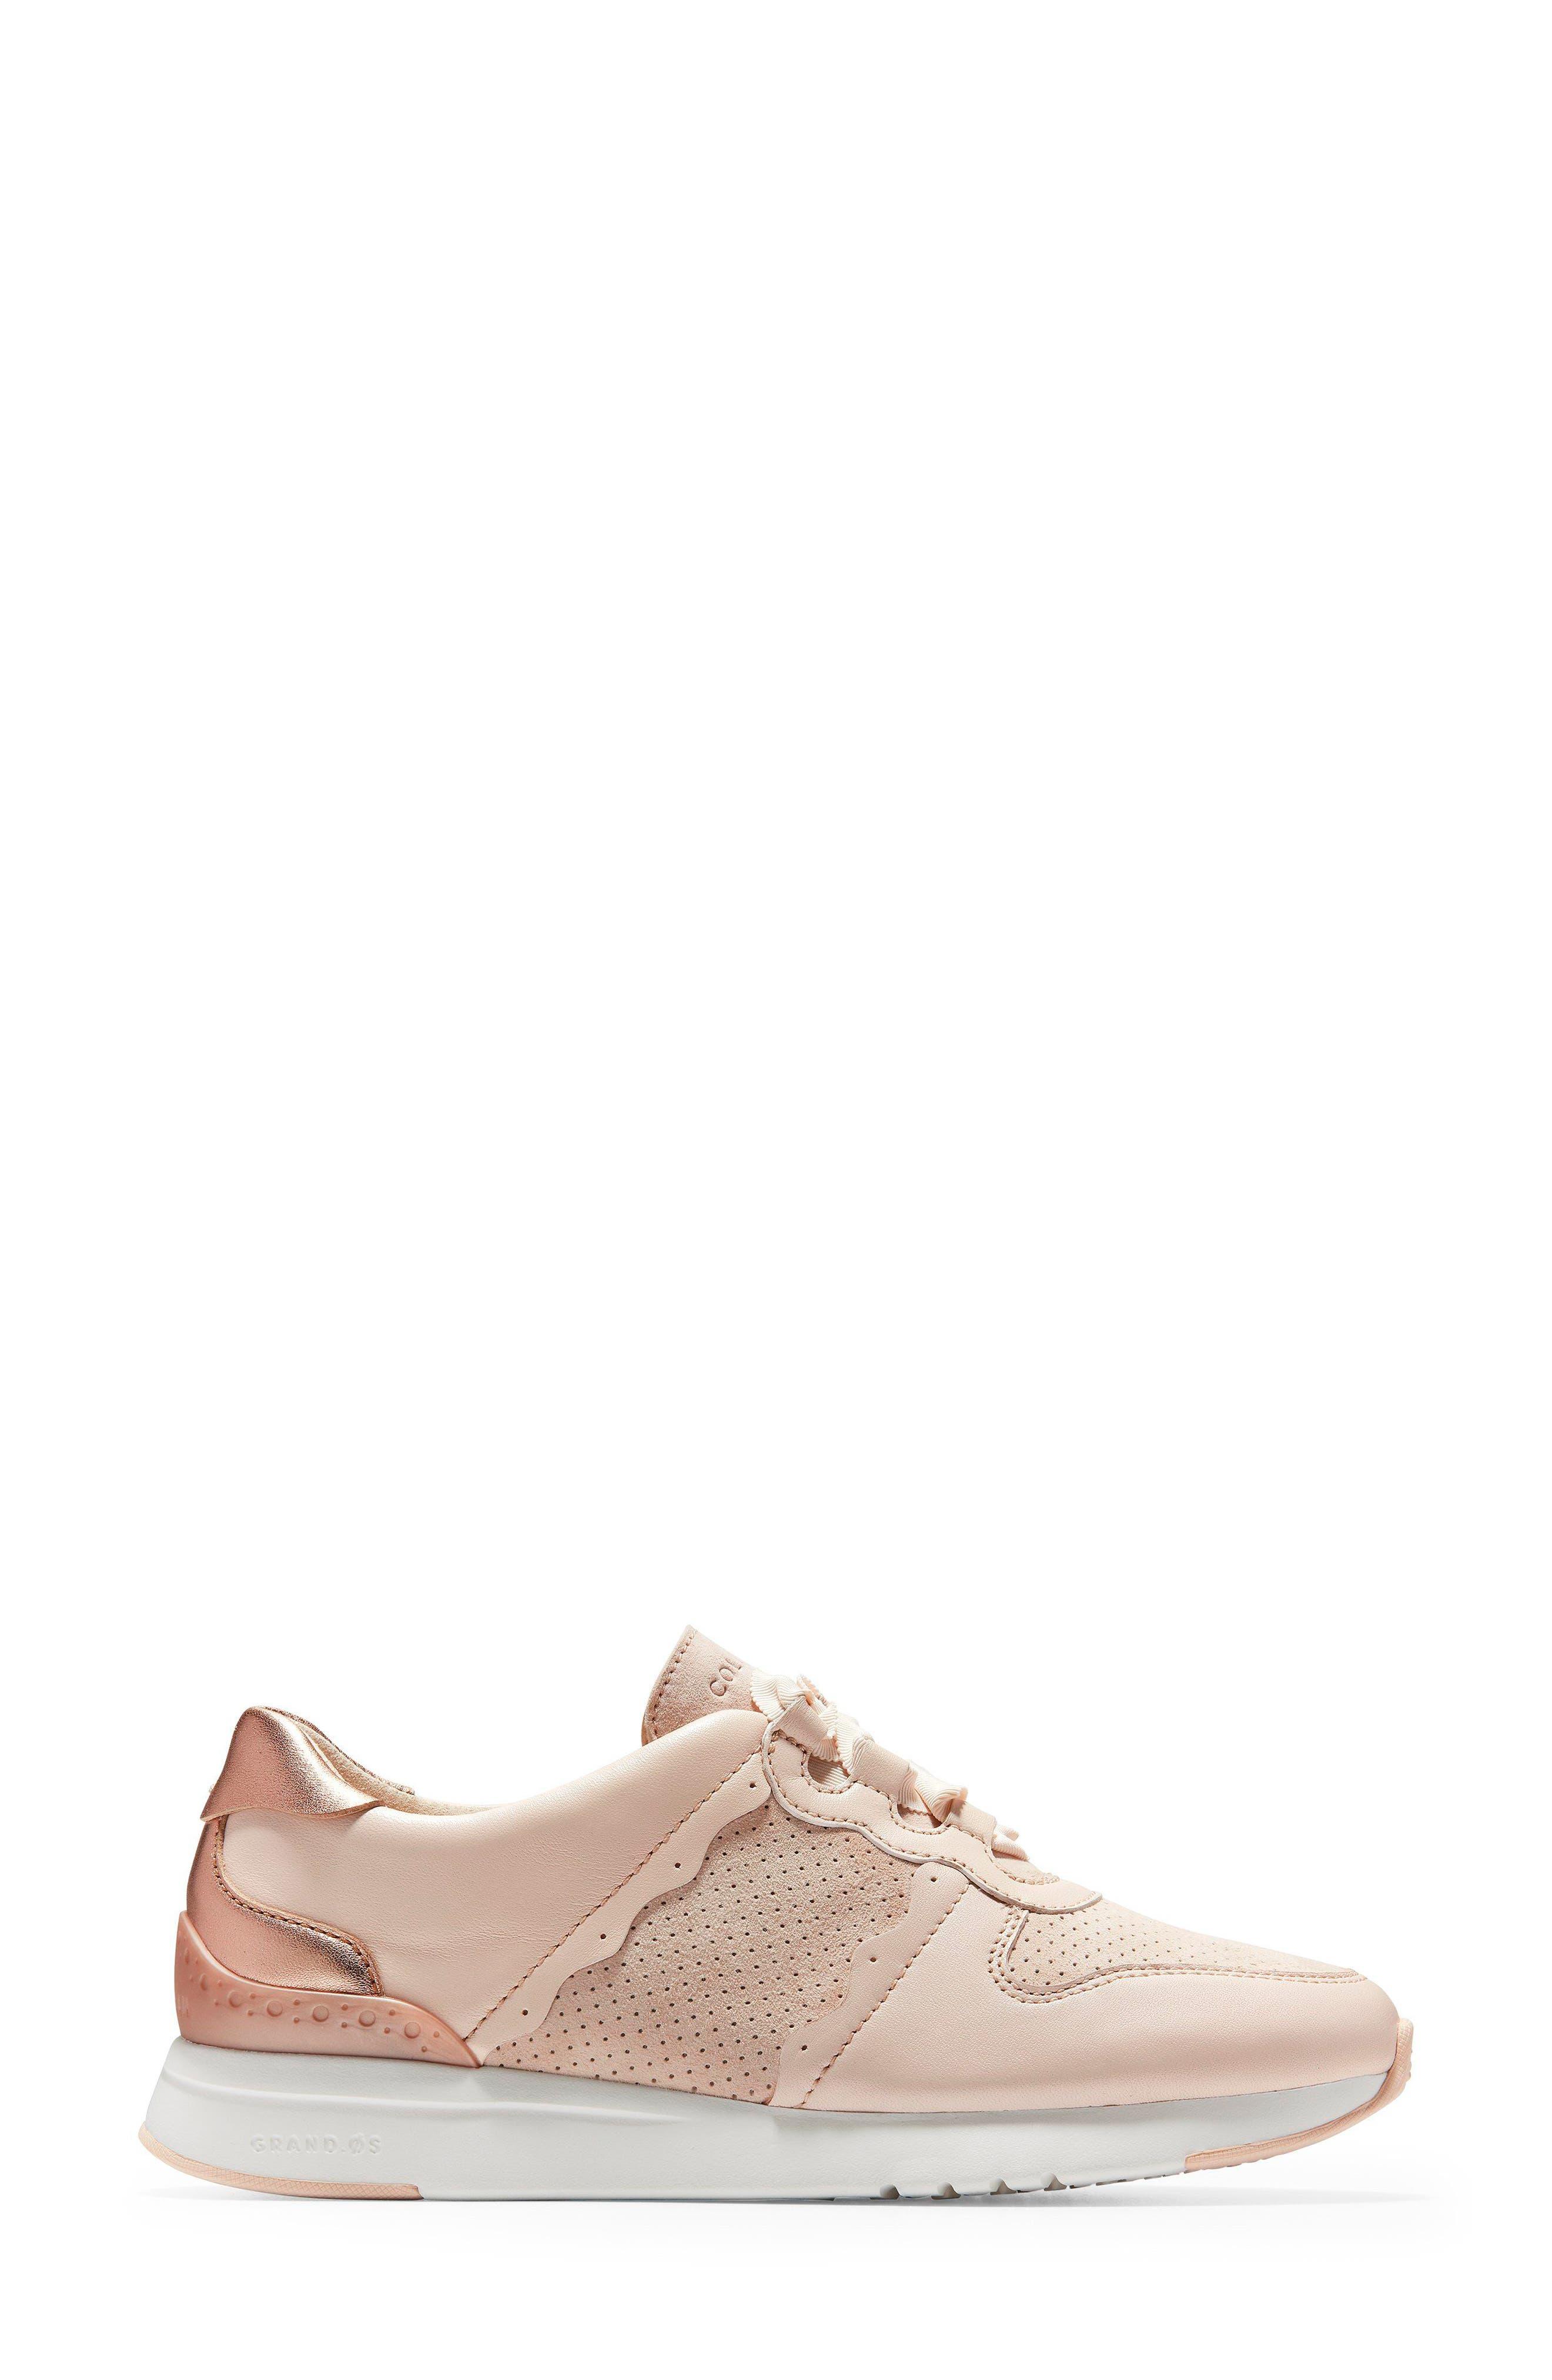 GrandPro Wedge Sneaker,                             Alternate thumbnail 3, color,                             Peach Blush Suede